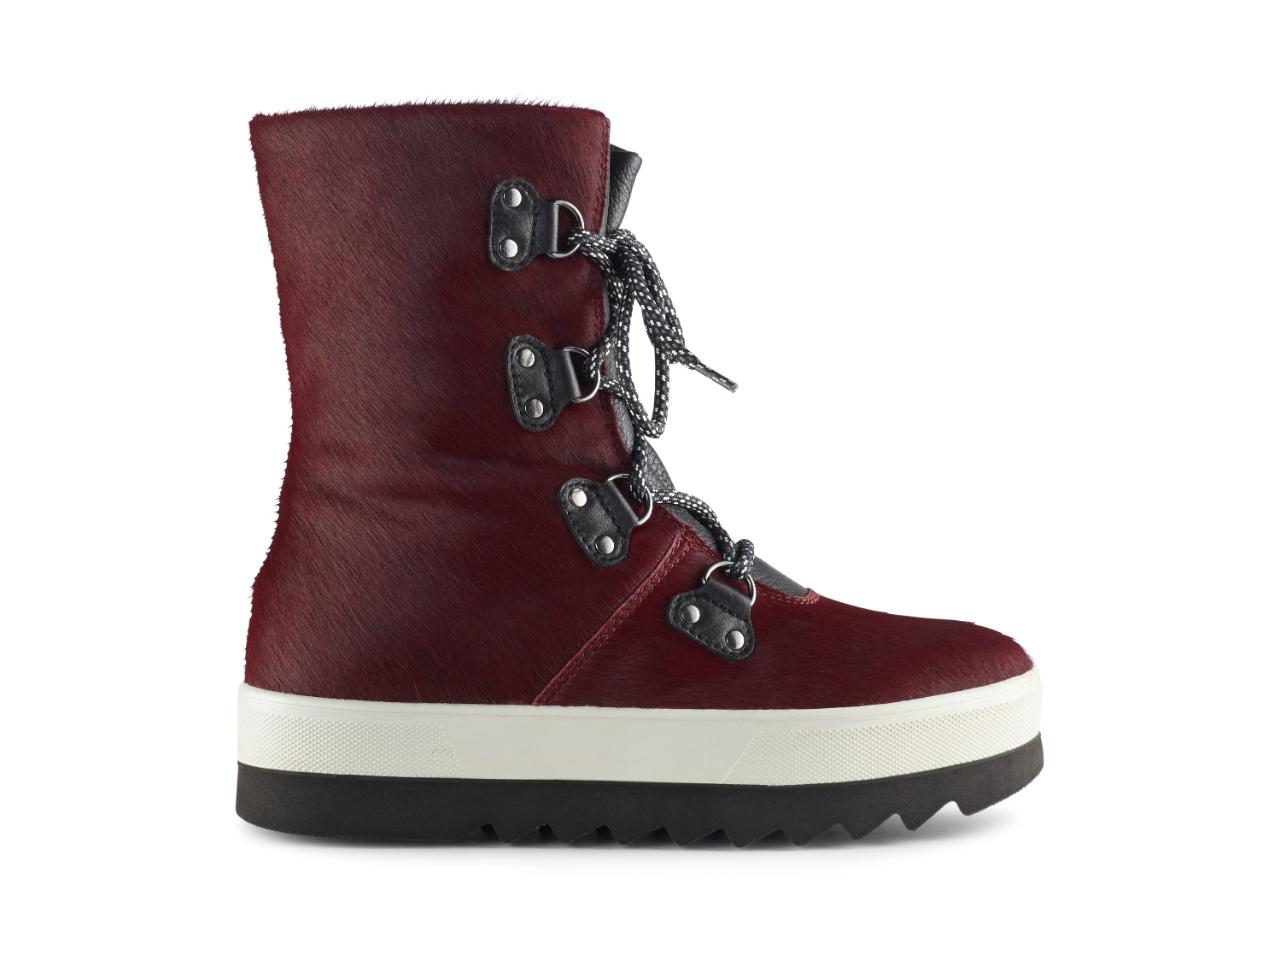 Warm Winter Boots To Combat Slush